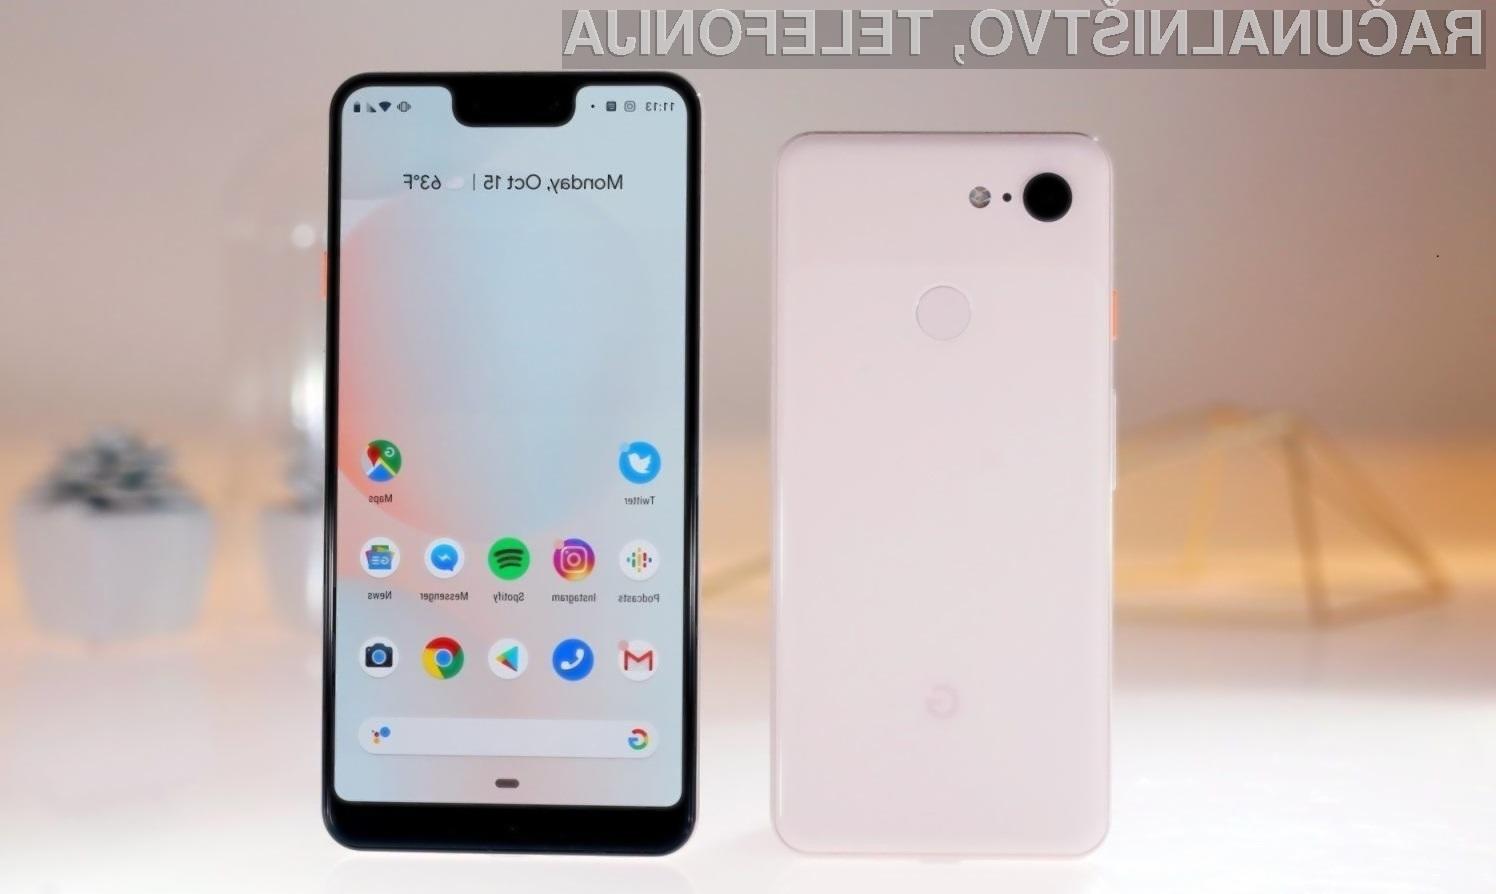 Glavna aduta telefona Pixel 3a in Pixel 3a XL sta fotoaparat in Android.